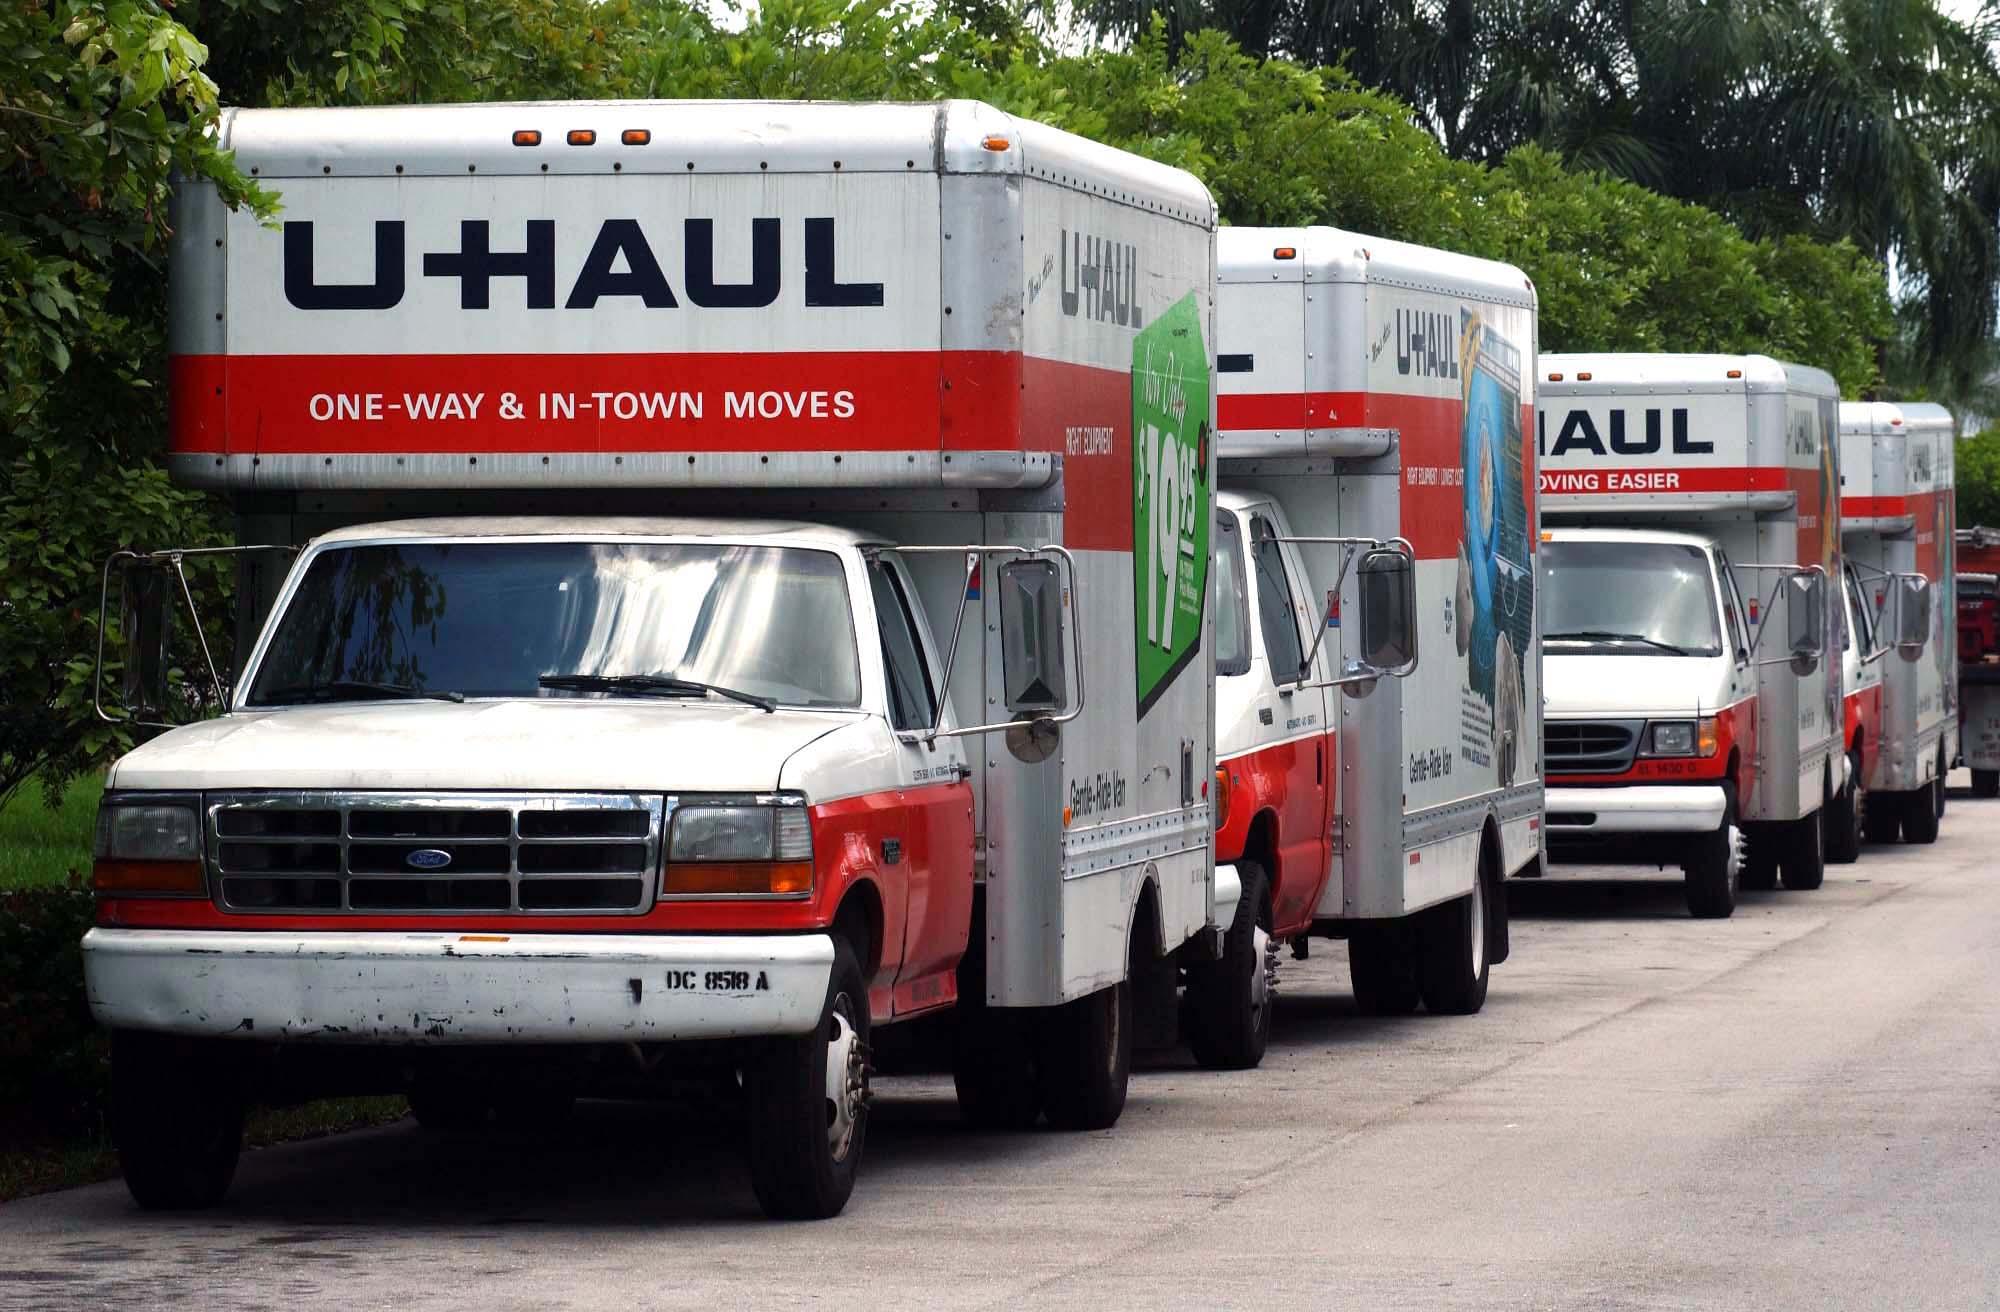 Uhaul Truck S Hidden U Haul Billionaire Emerges With Storage Empire Bloomberg